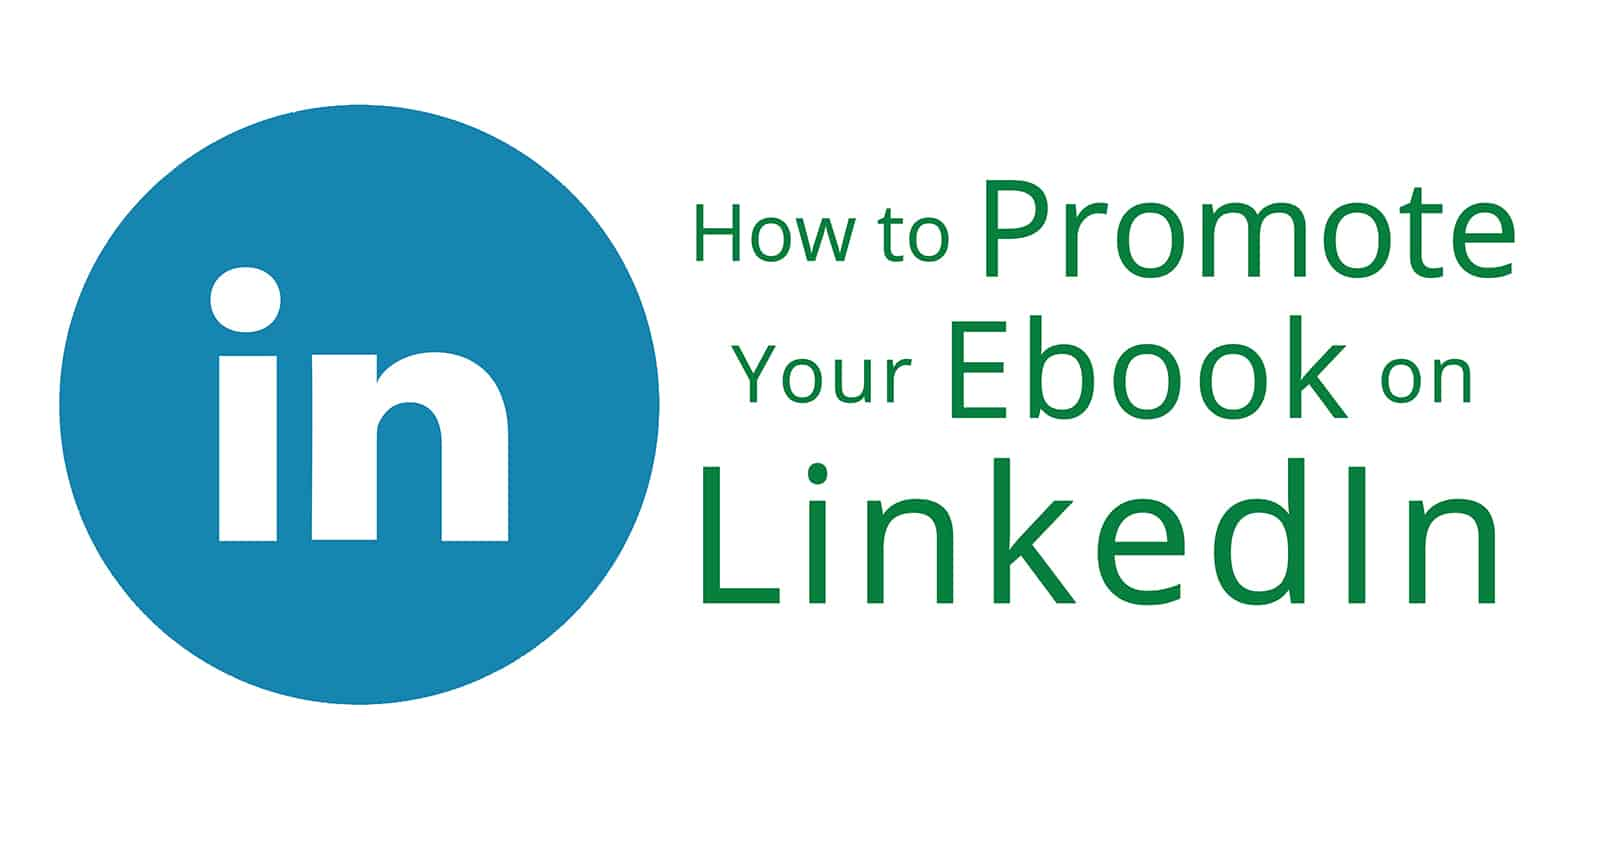 Promote your ebook on LinkedIn